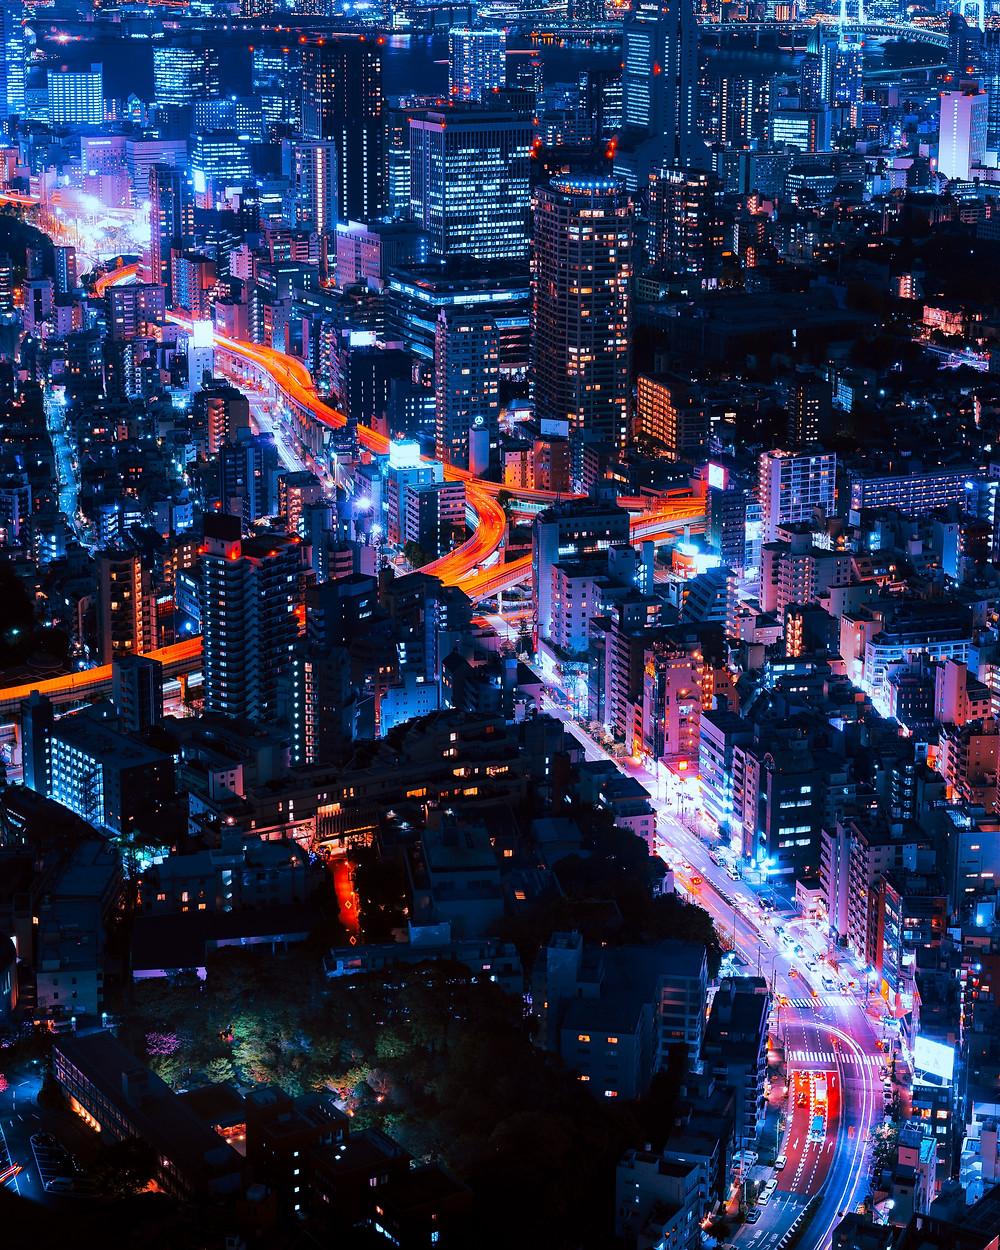 City night with traffic